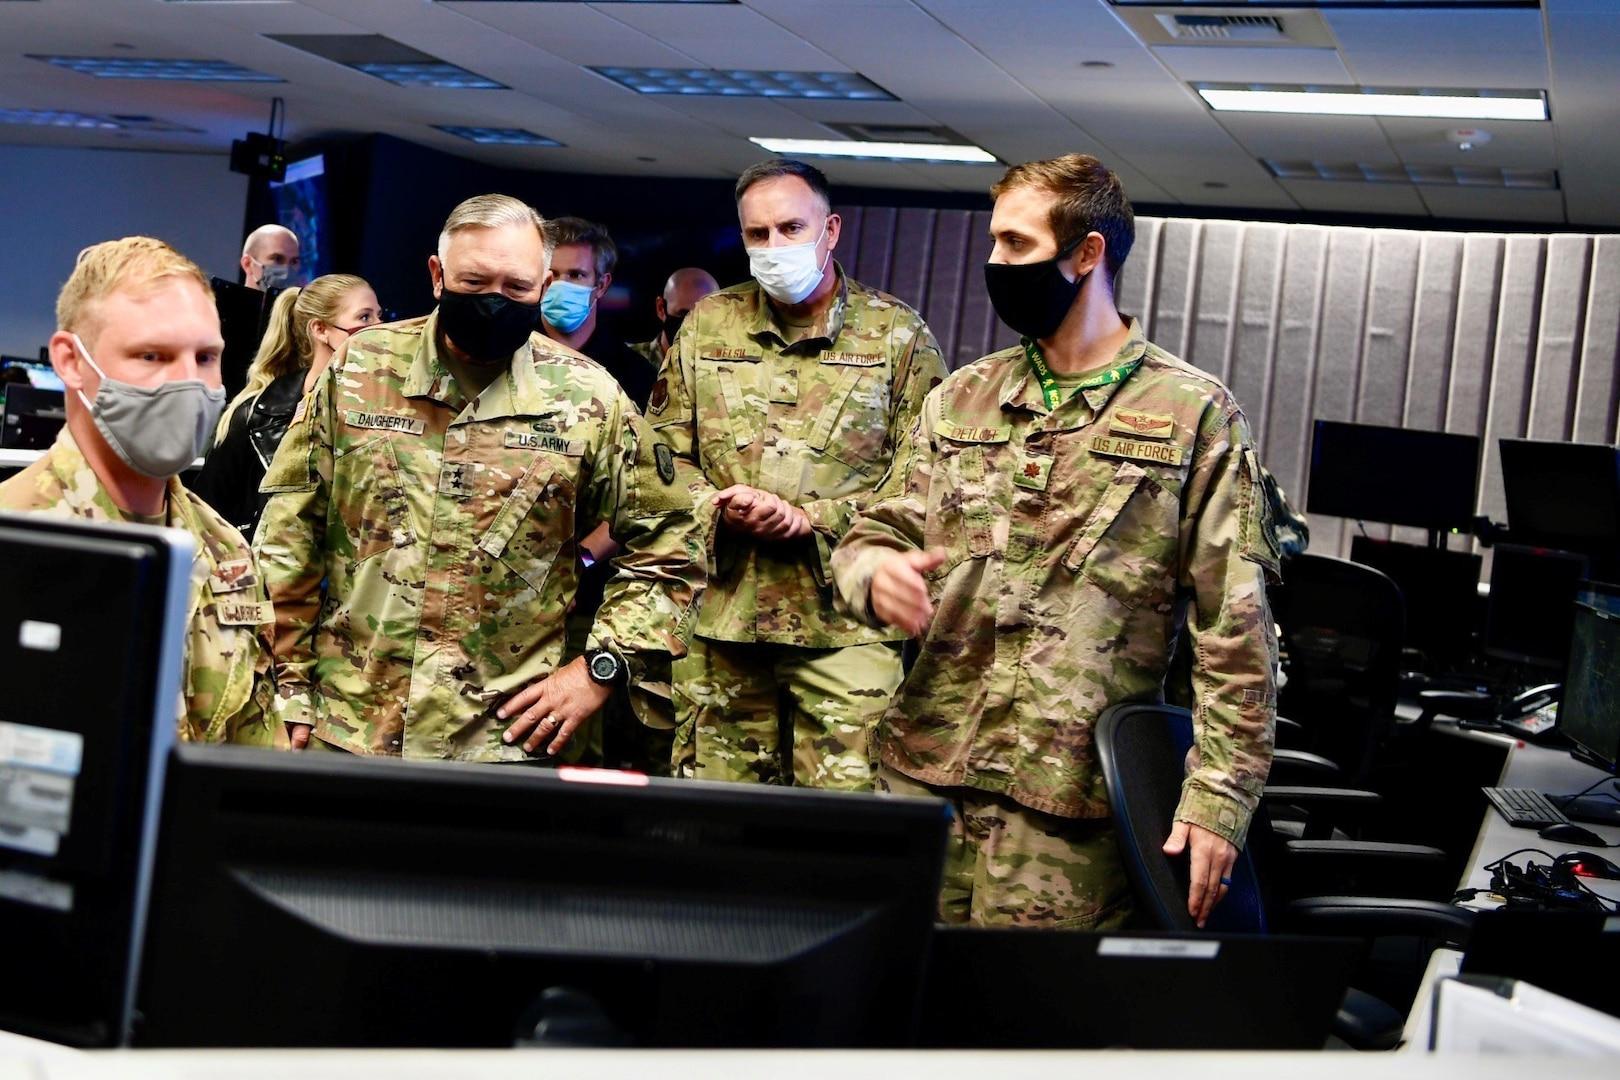 U.S. Army Maj. Gen. Bret Daugherty, adjutant general, Washington National Guard, second from left, and U.S. Air Force Brig. Gen. Gent Welsh, commander, Washington Air National Guard, second from right, observe software demonstrations during an Advanced Battle Management System (ABMS) onramp event at Joint Base Lewis-McChord, Wash., Sept. 2-3, 2020.